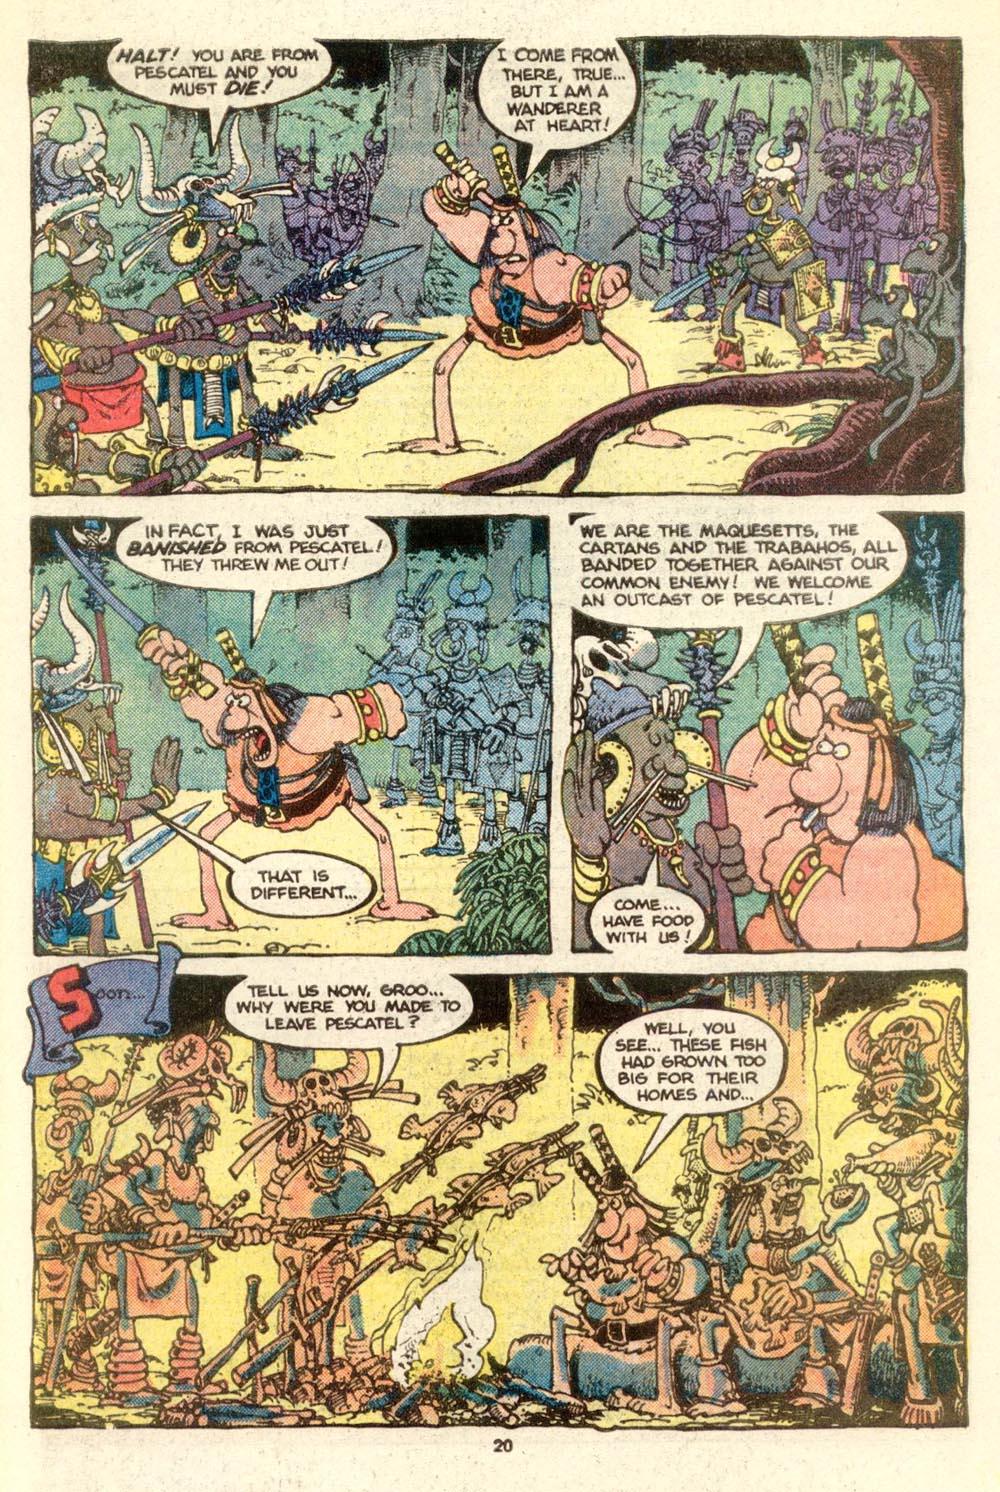 Read online Sergio Aragonés Groo the Wanderer comic -  Issue #17 - 20